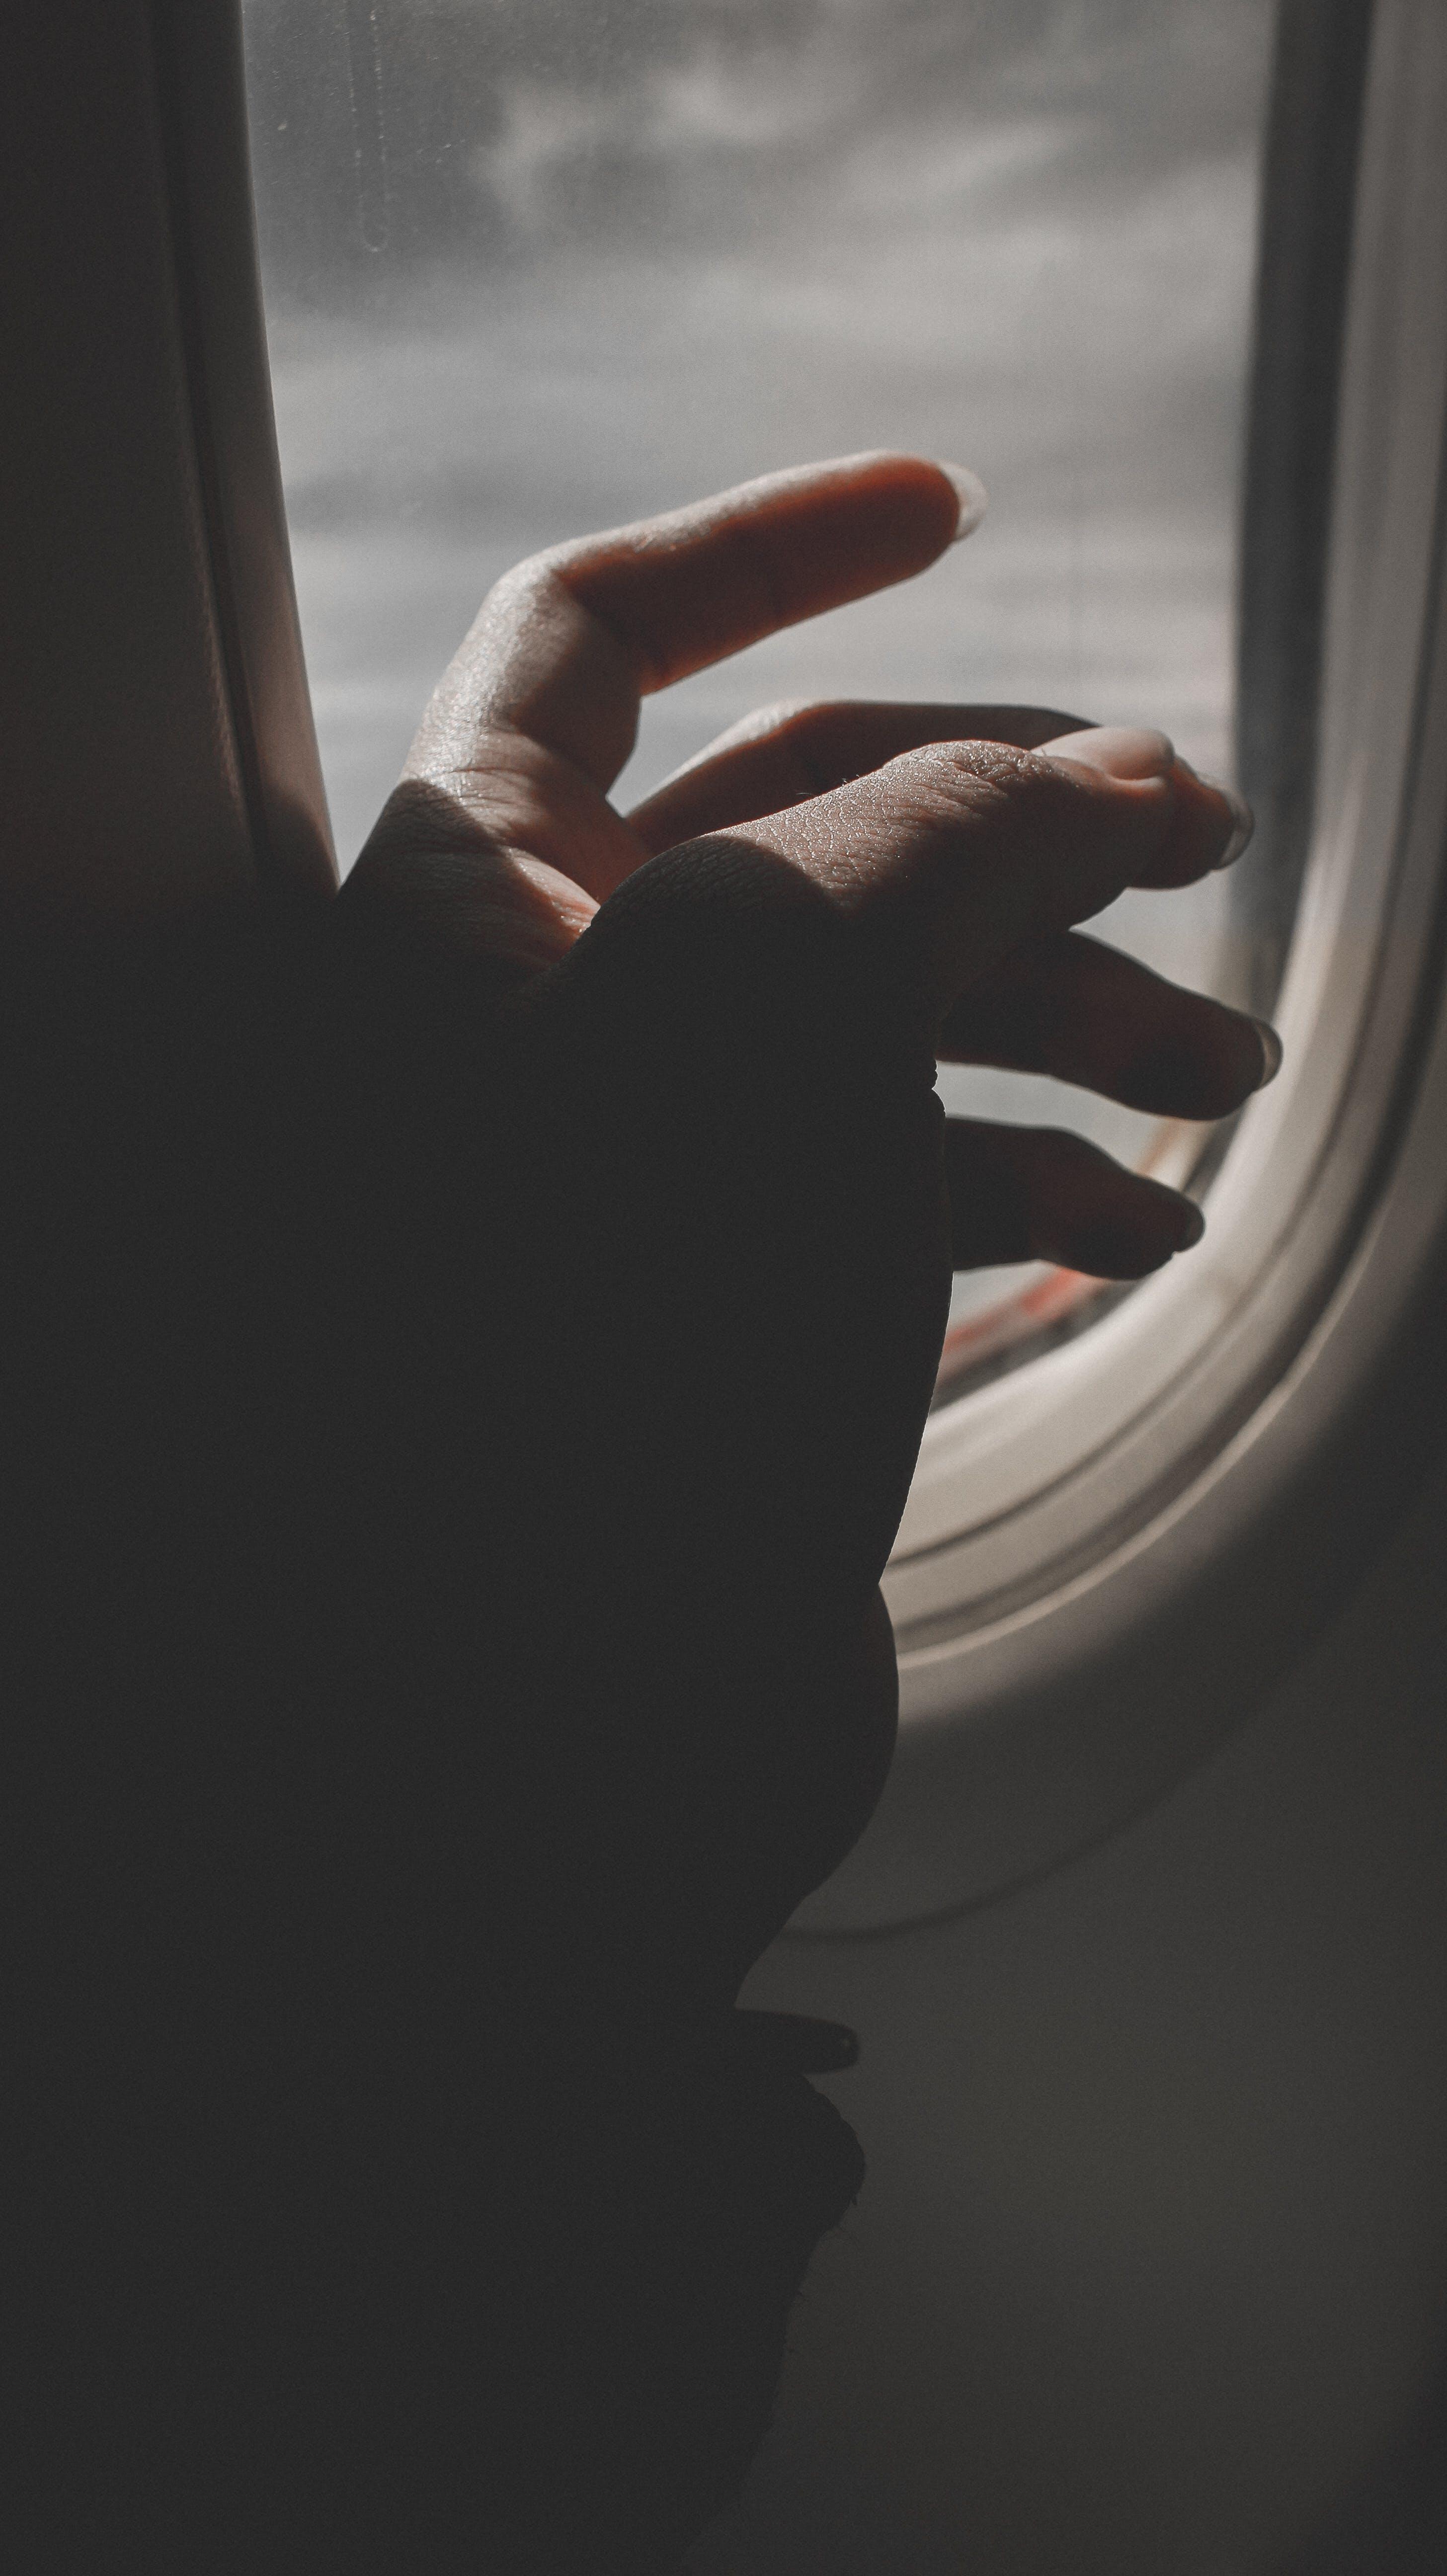 Hand By Airplane Window